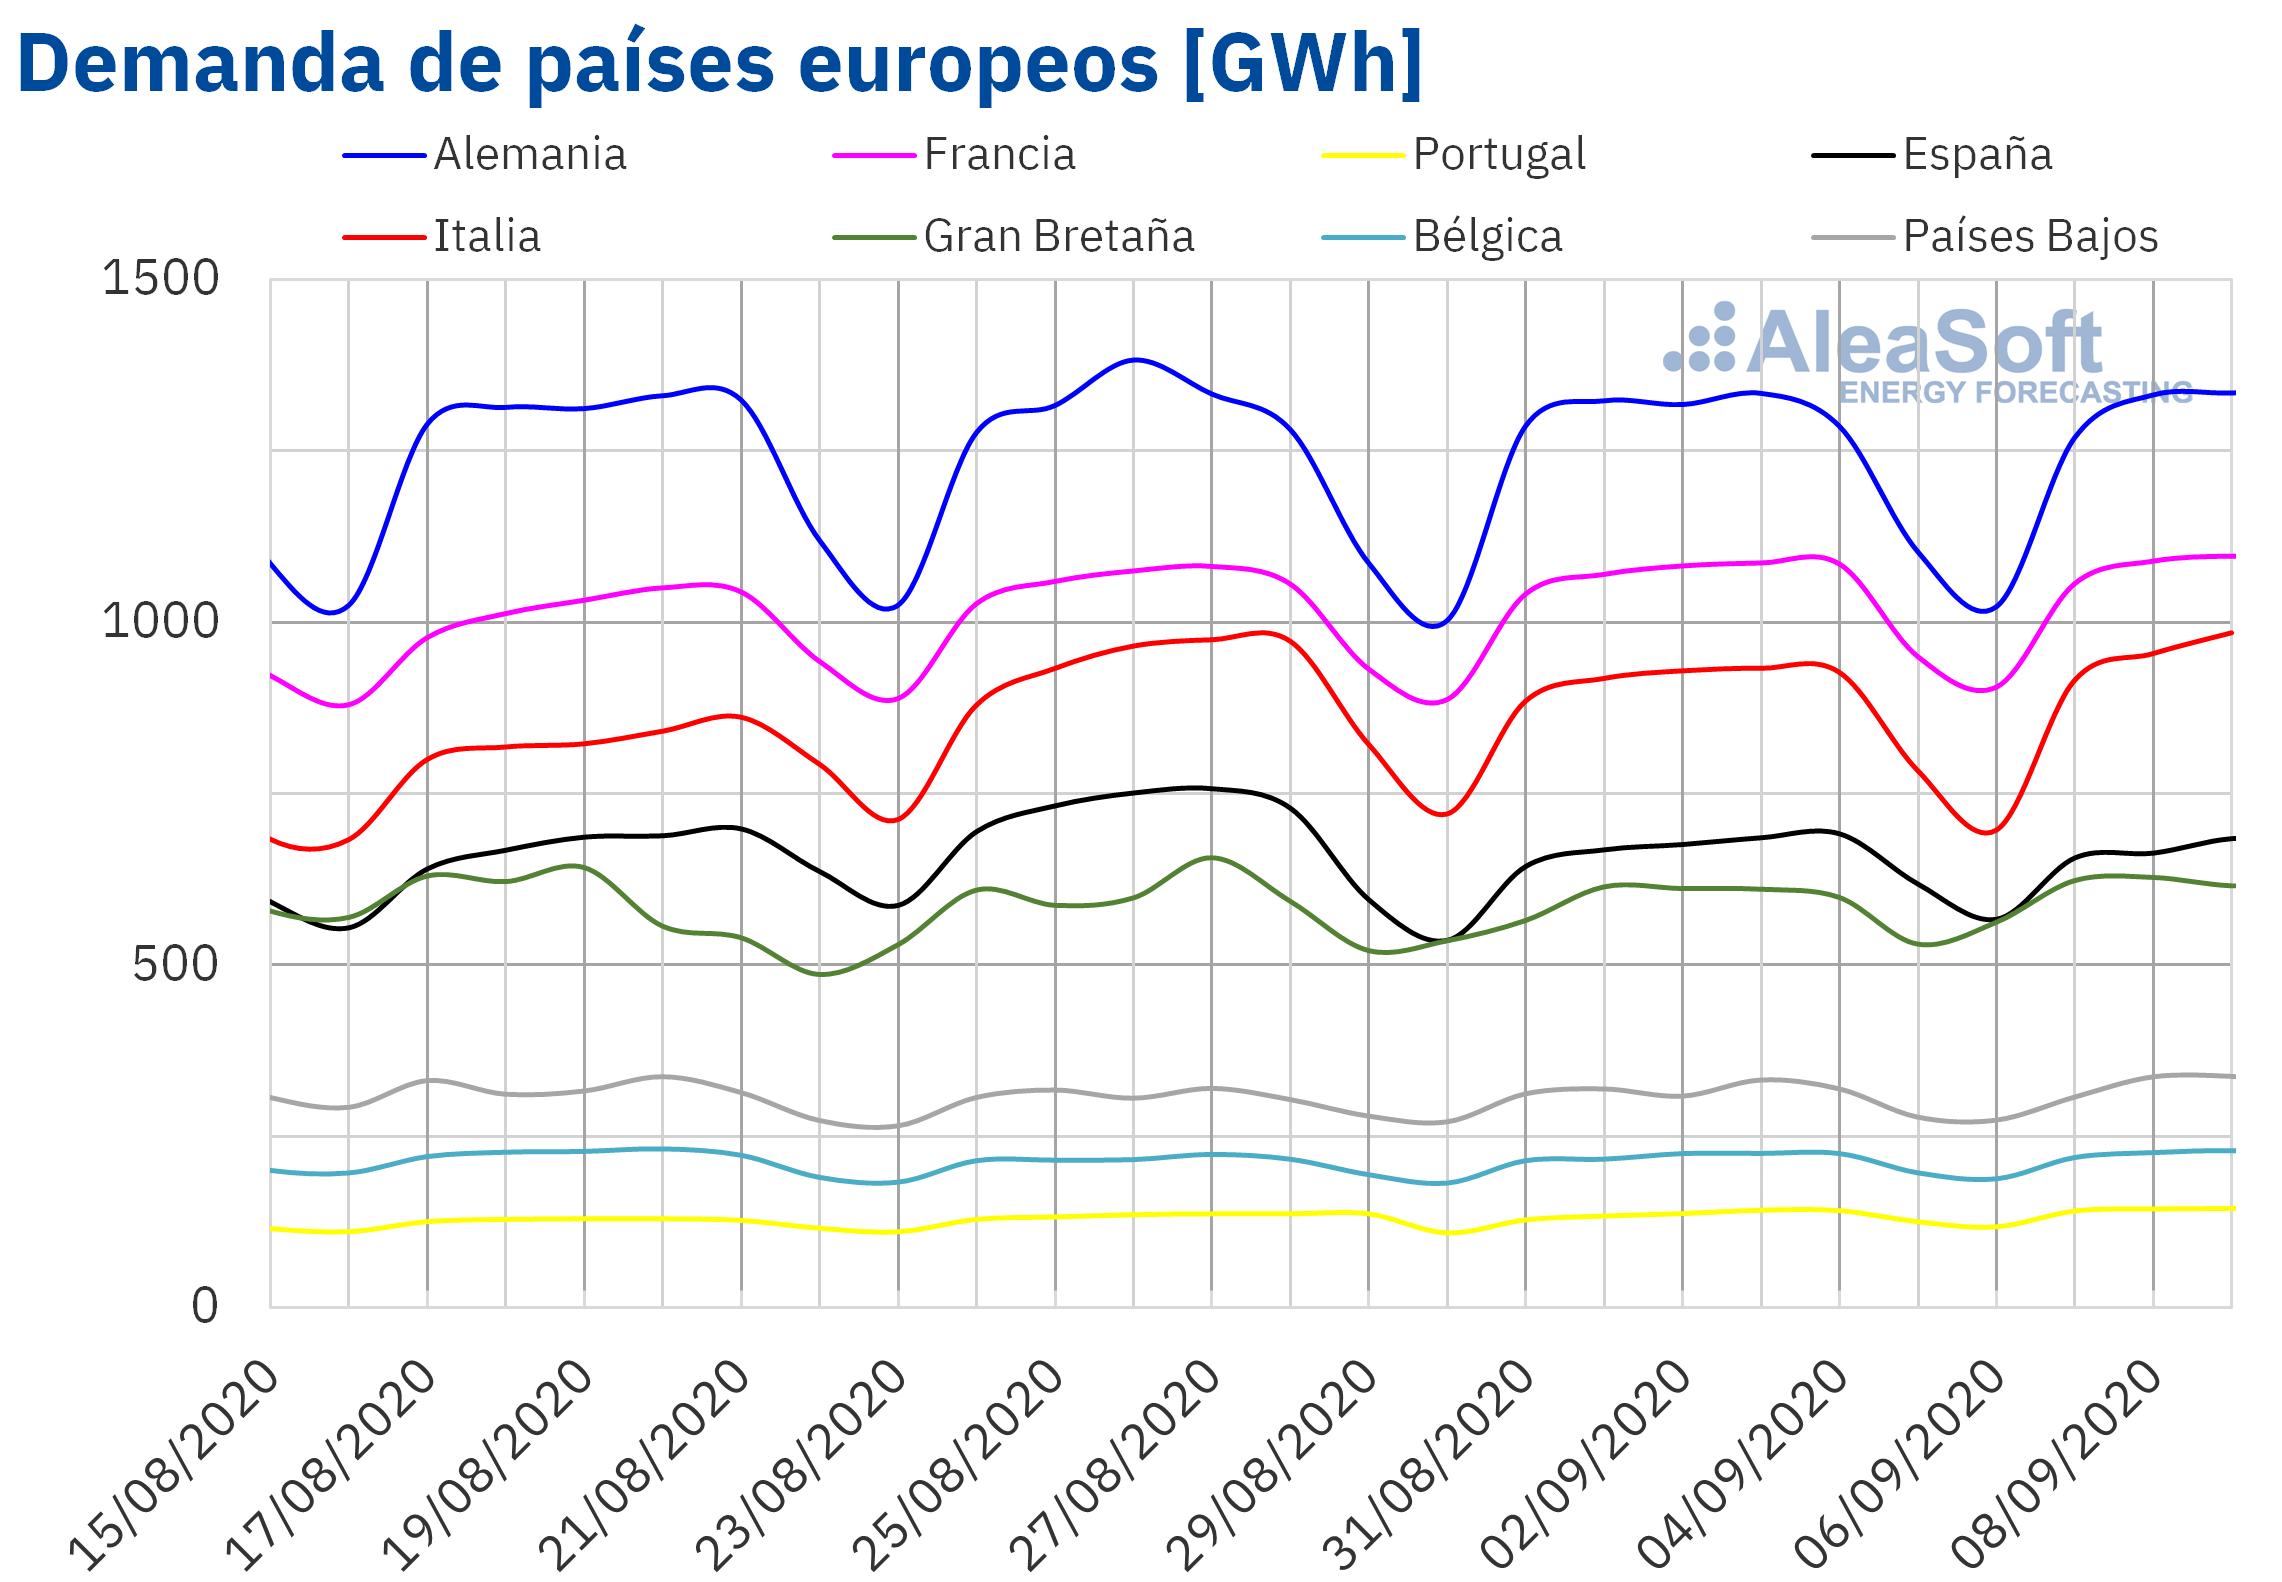 AleaSoft - Demanda de países de Europa